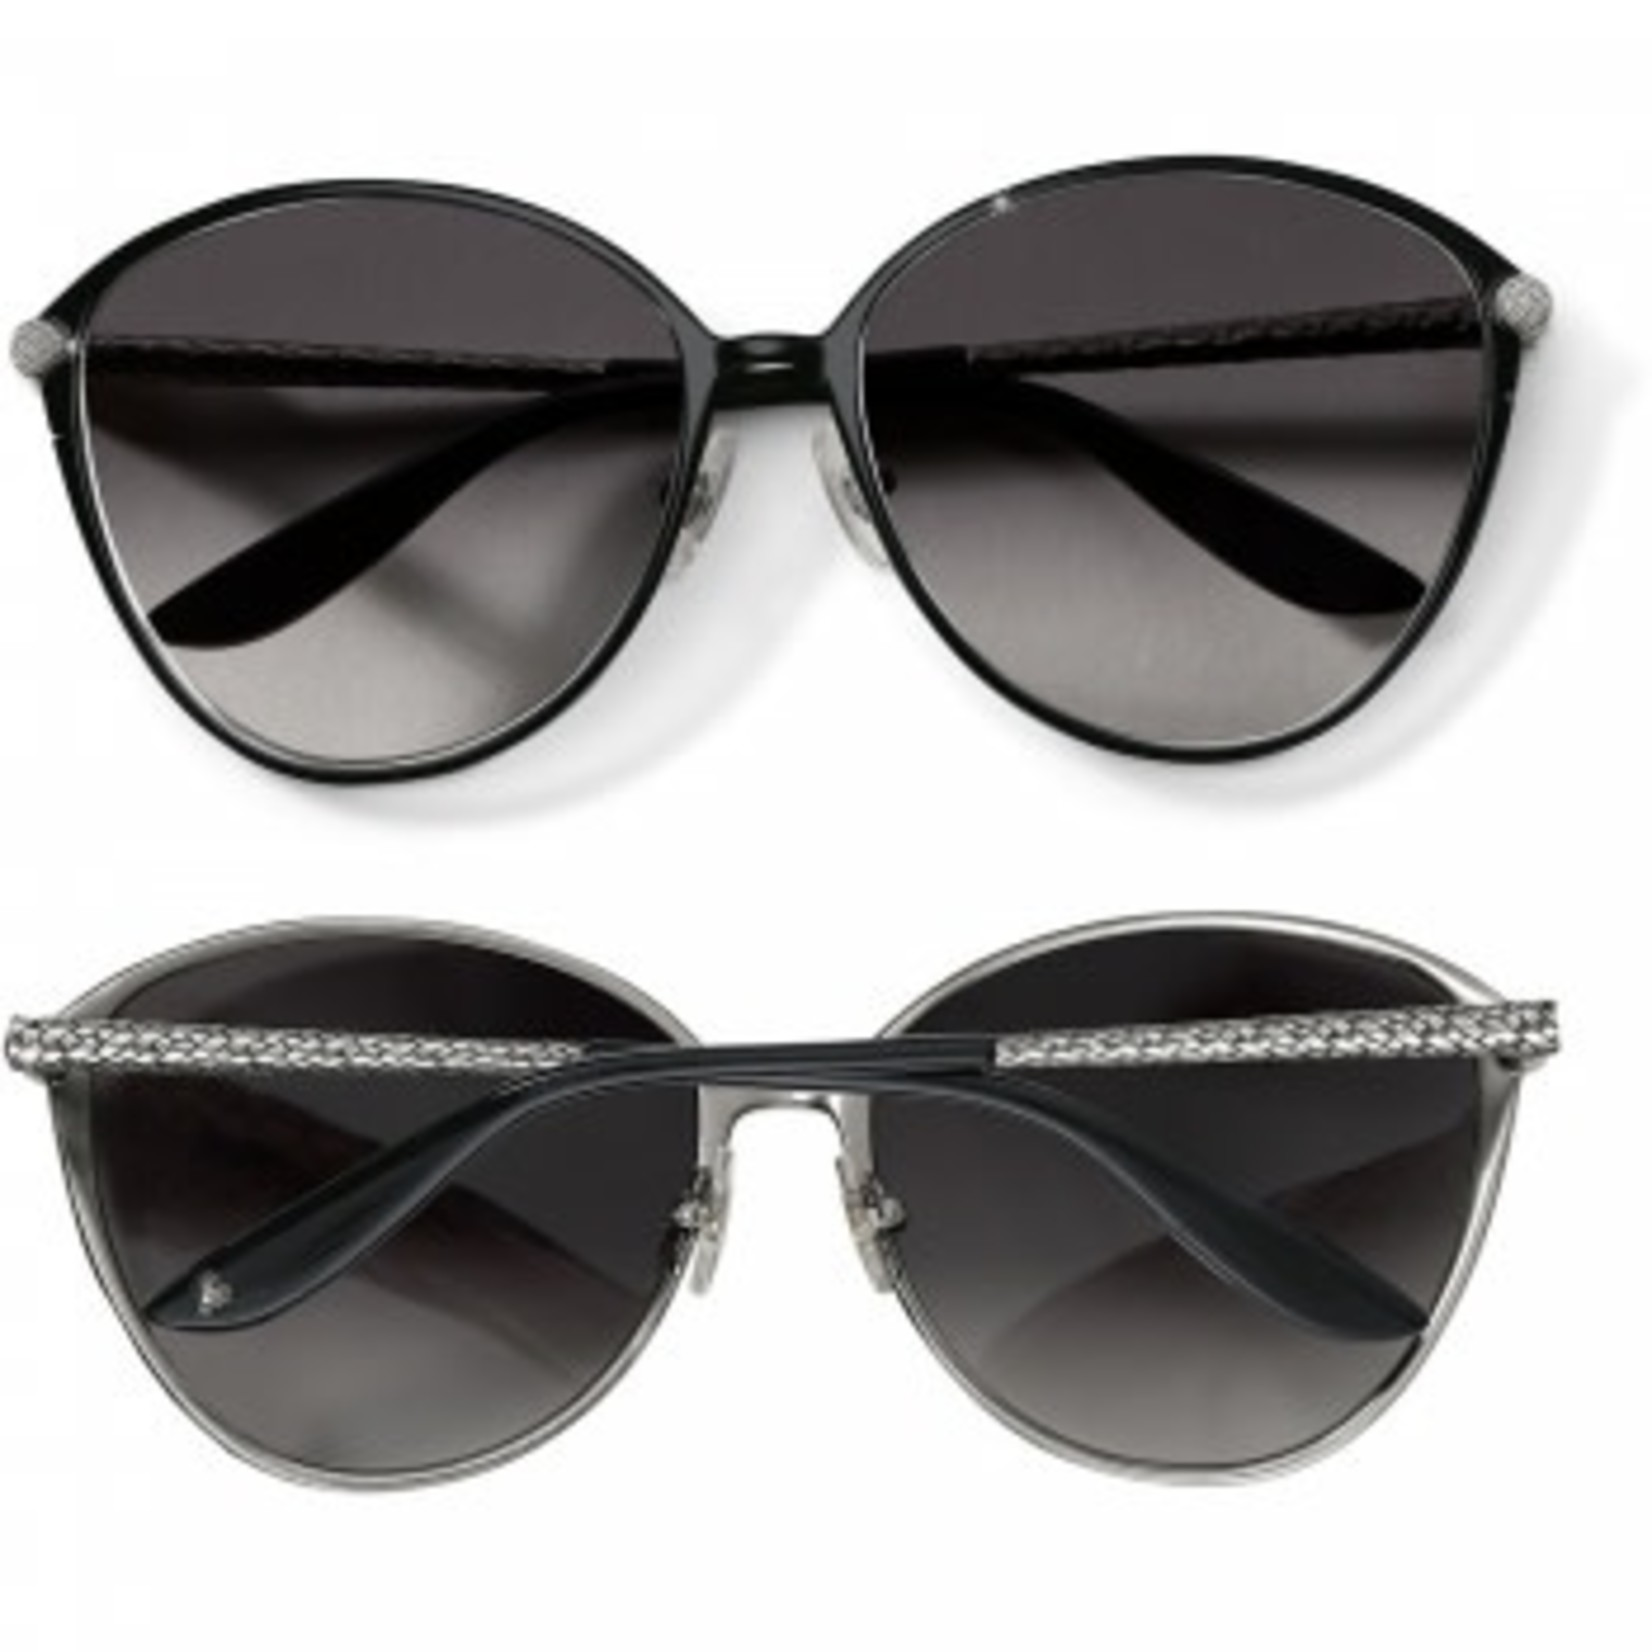 Brighton Ferrara Gatta Sunglasses